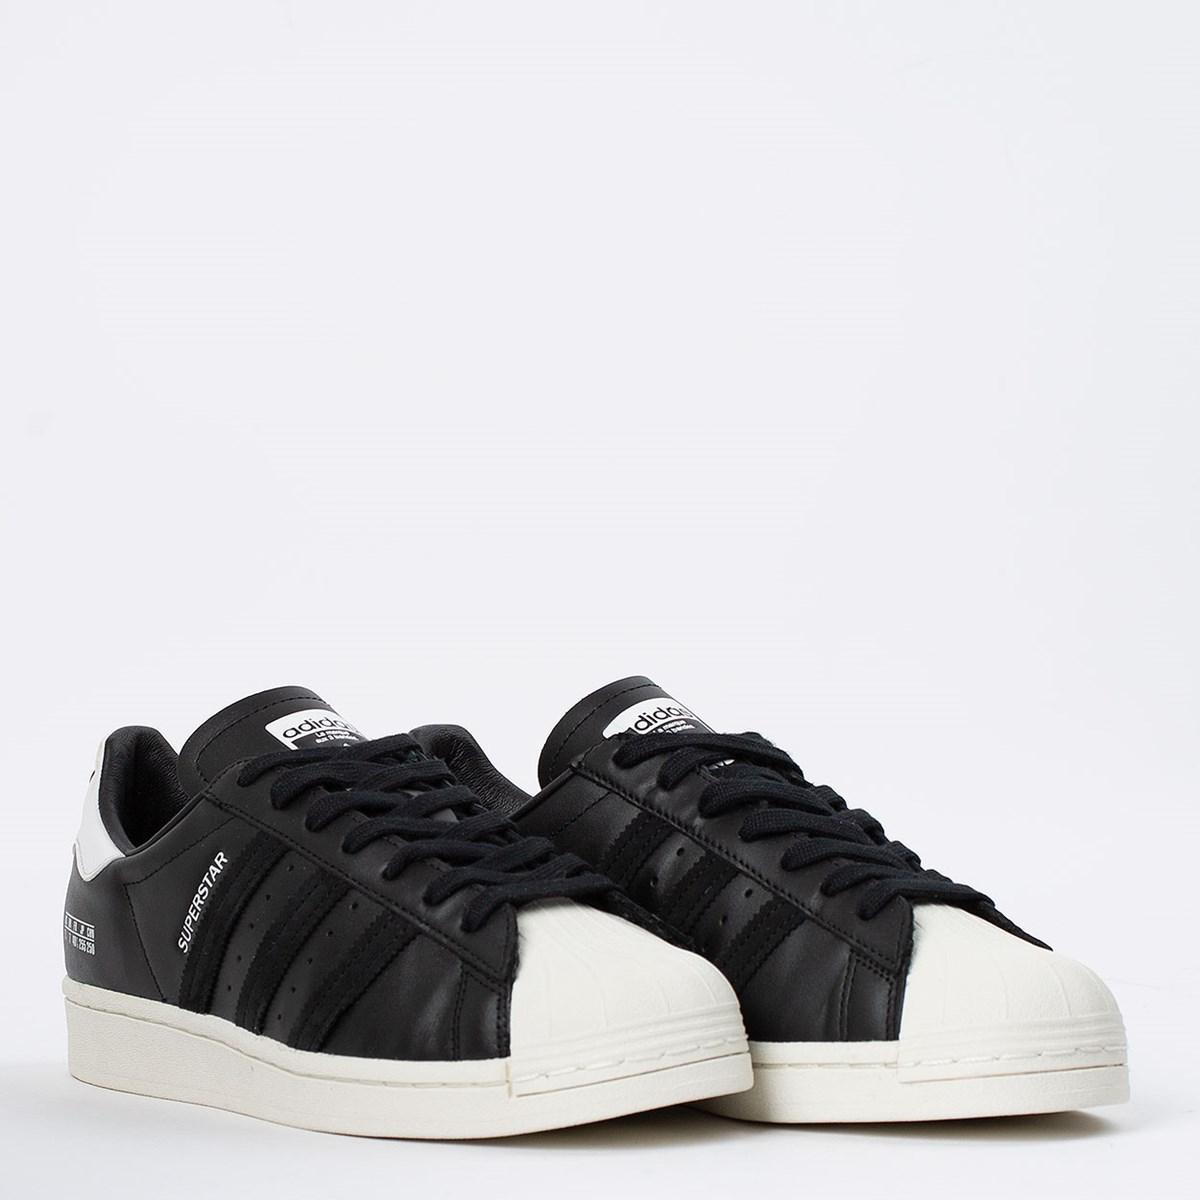 Tênis adidas Superstar Core Black Off White FV2809